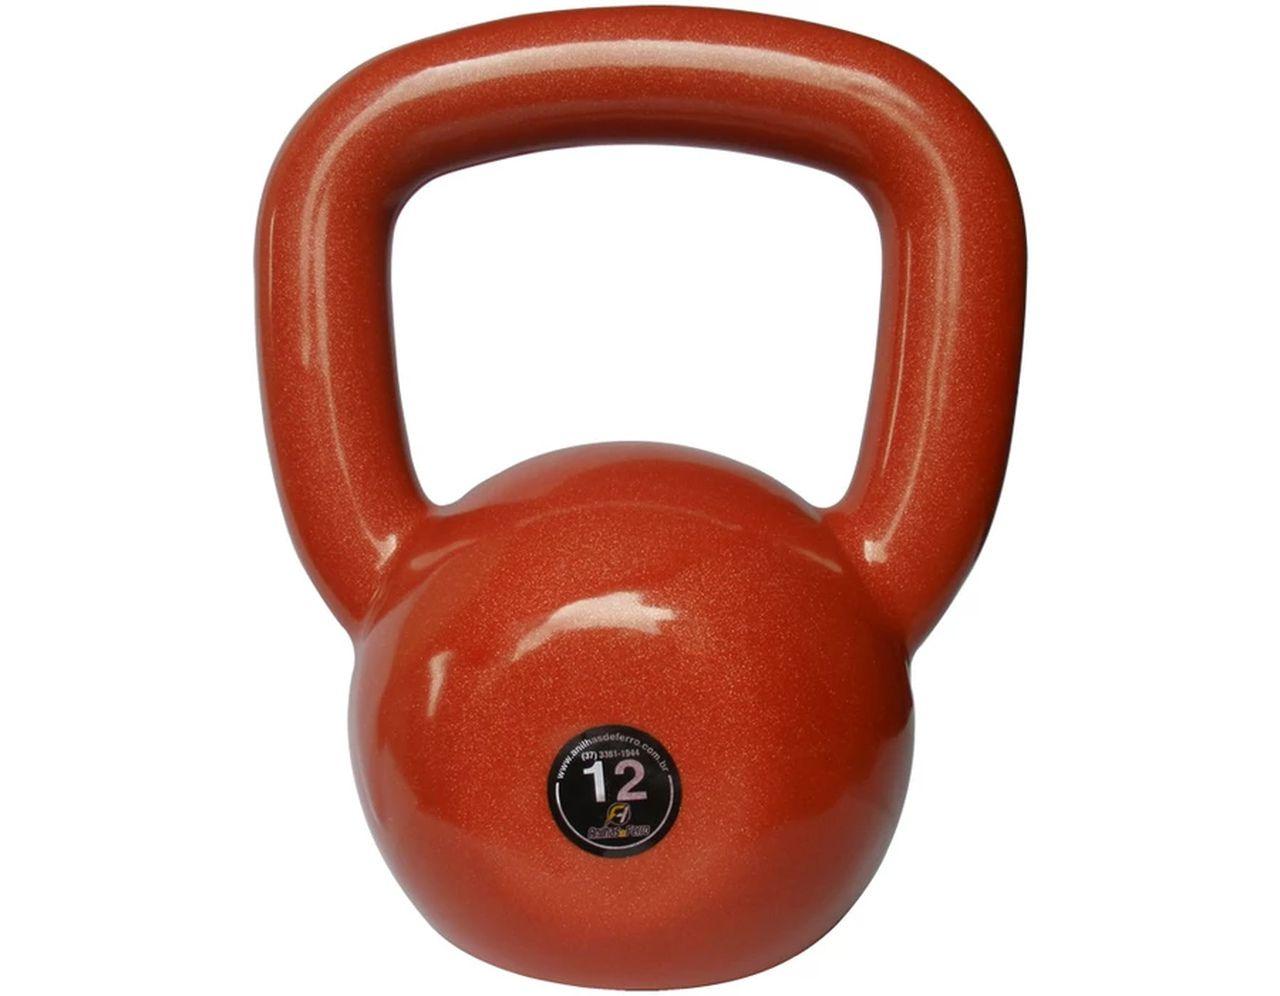 Kettlebell Emborrachado Treinamento Funcional Fitness 12,0kg  - Panela de Ferro Fundido